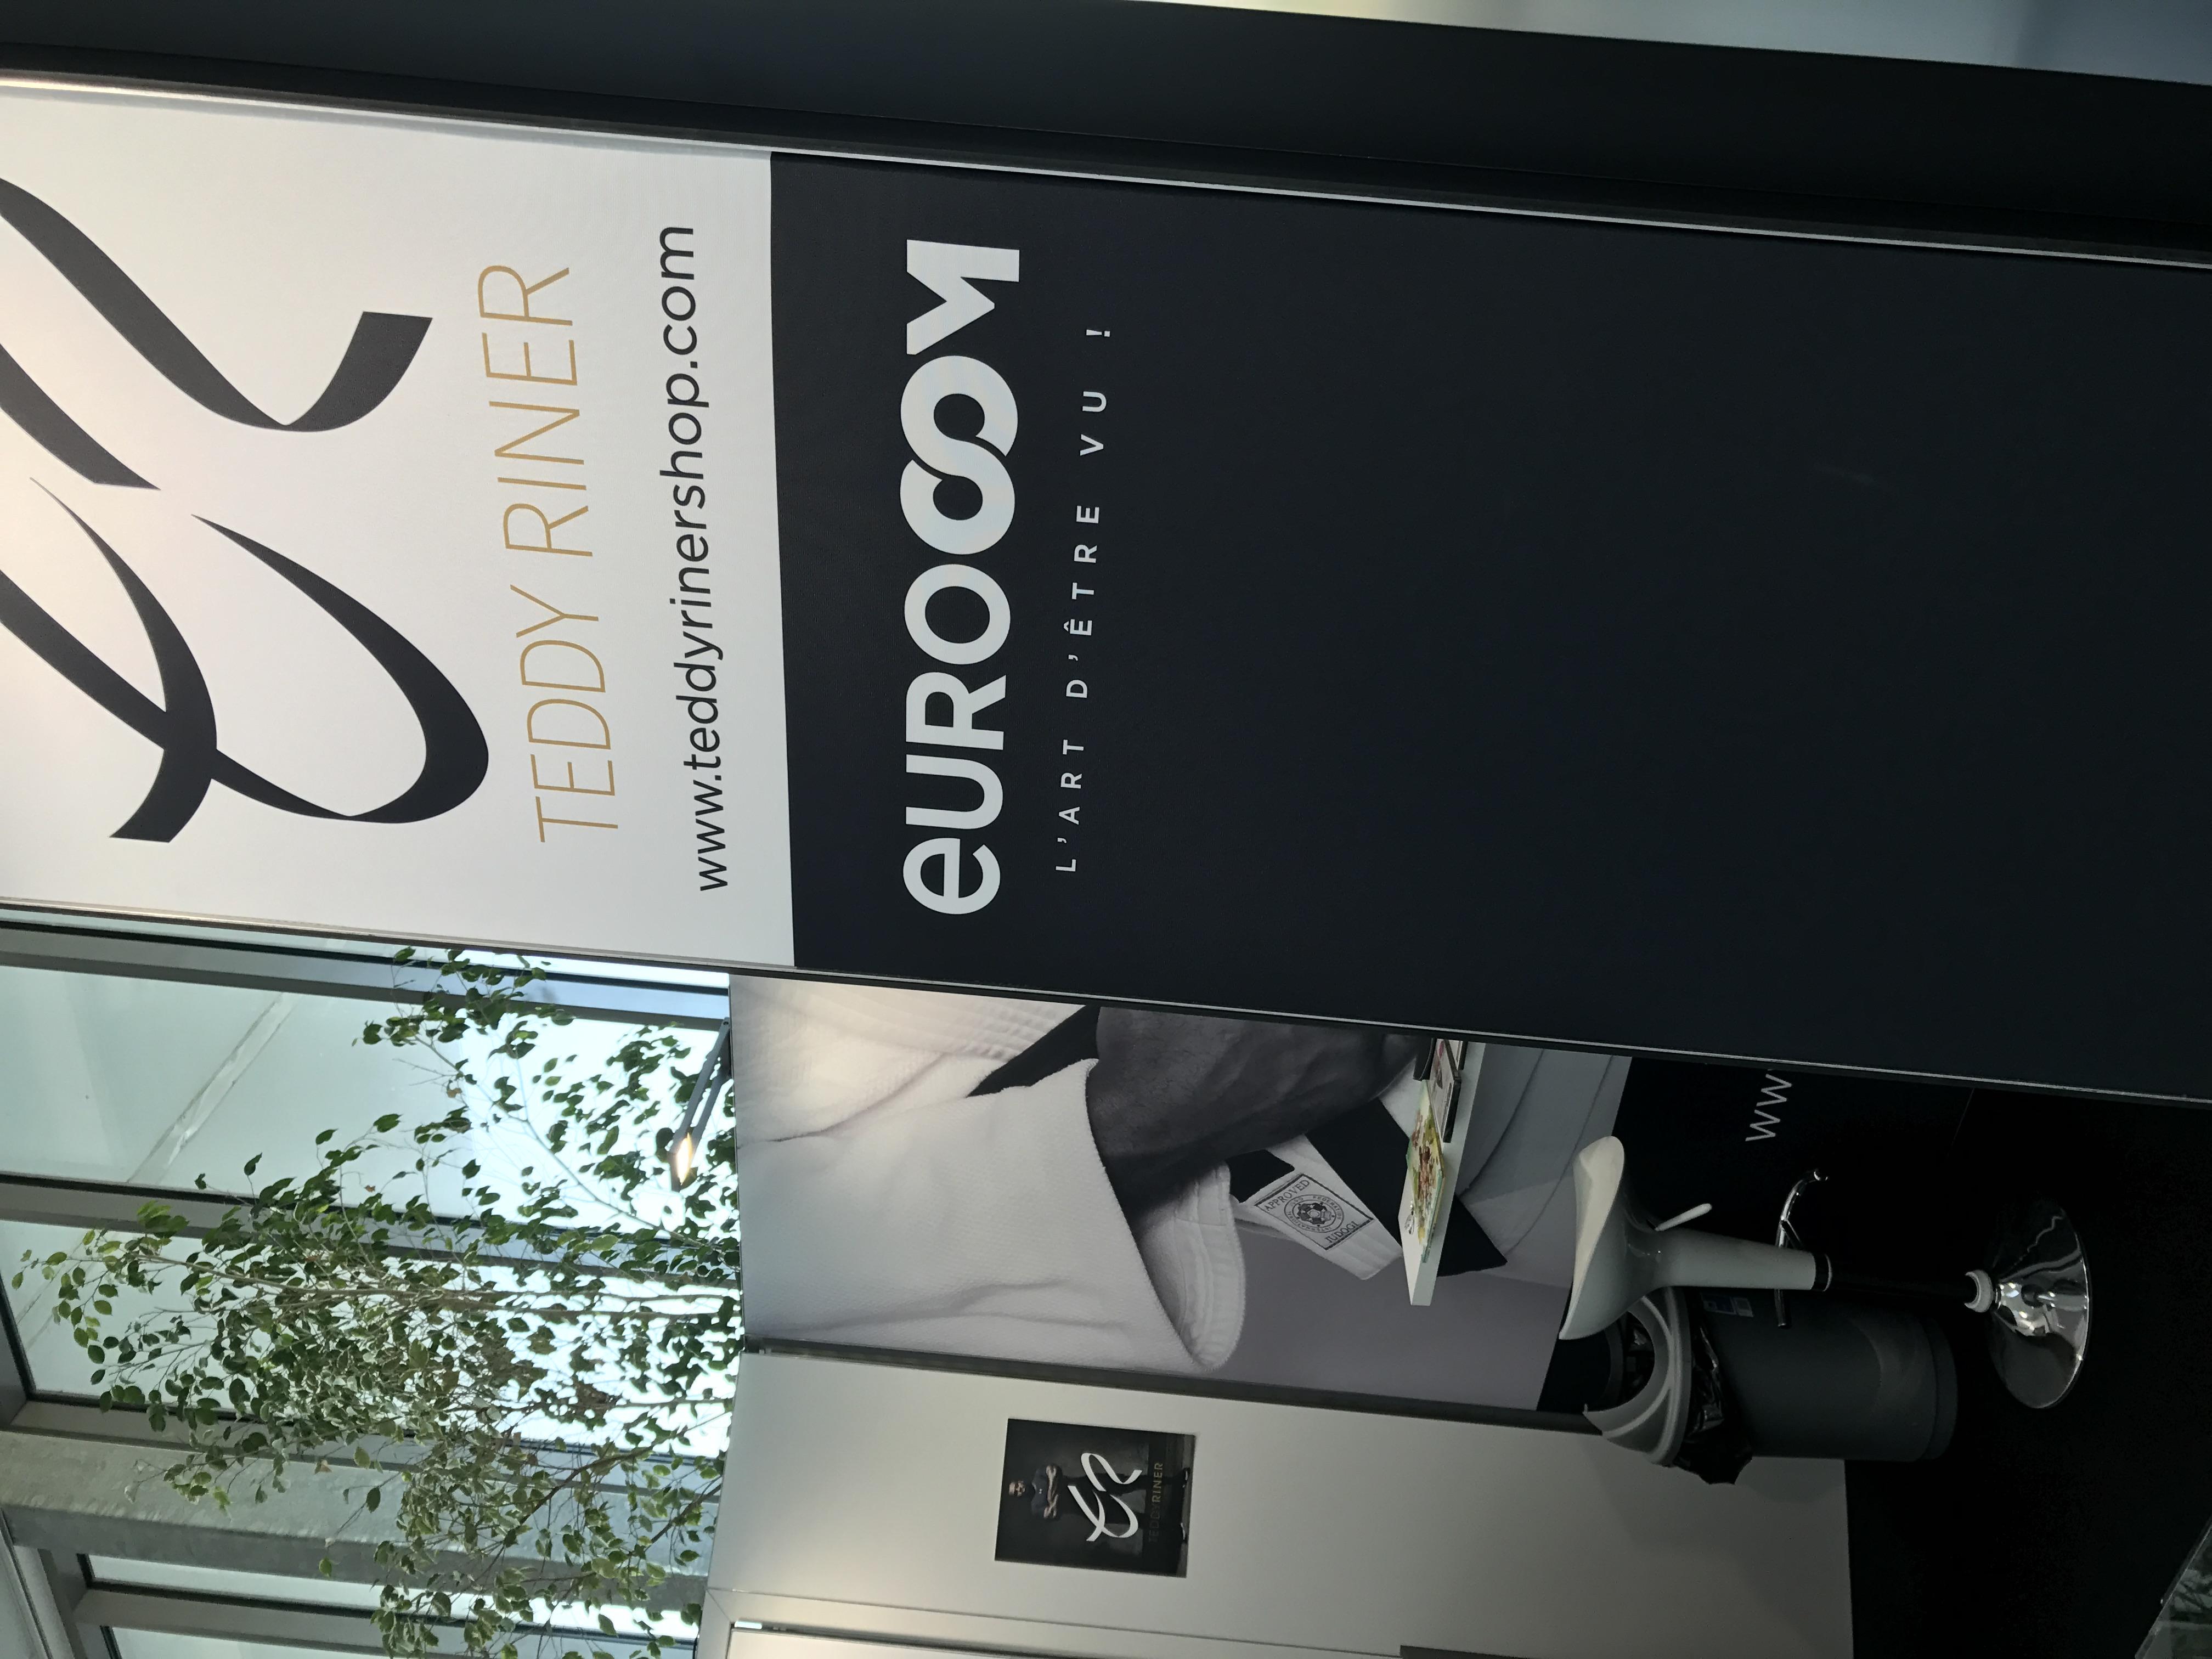 TEDDY RINER ACADEMY pour Eurocom